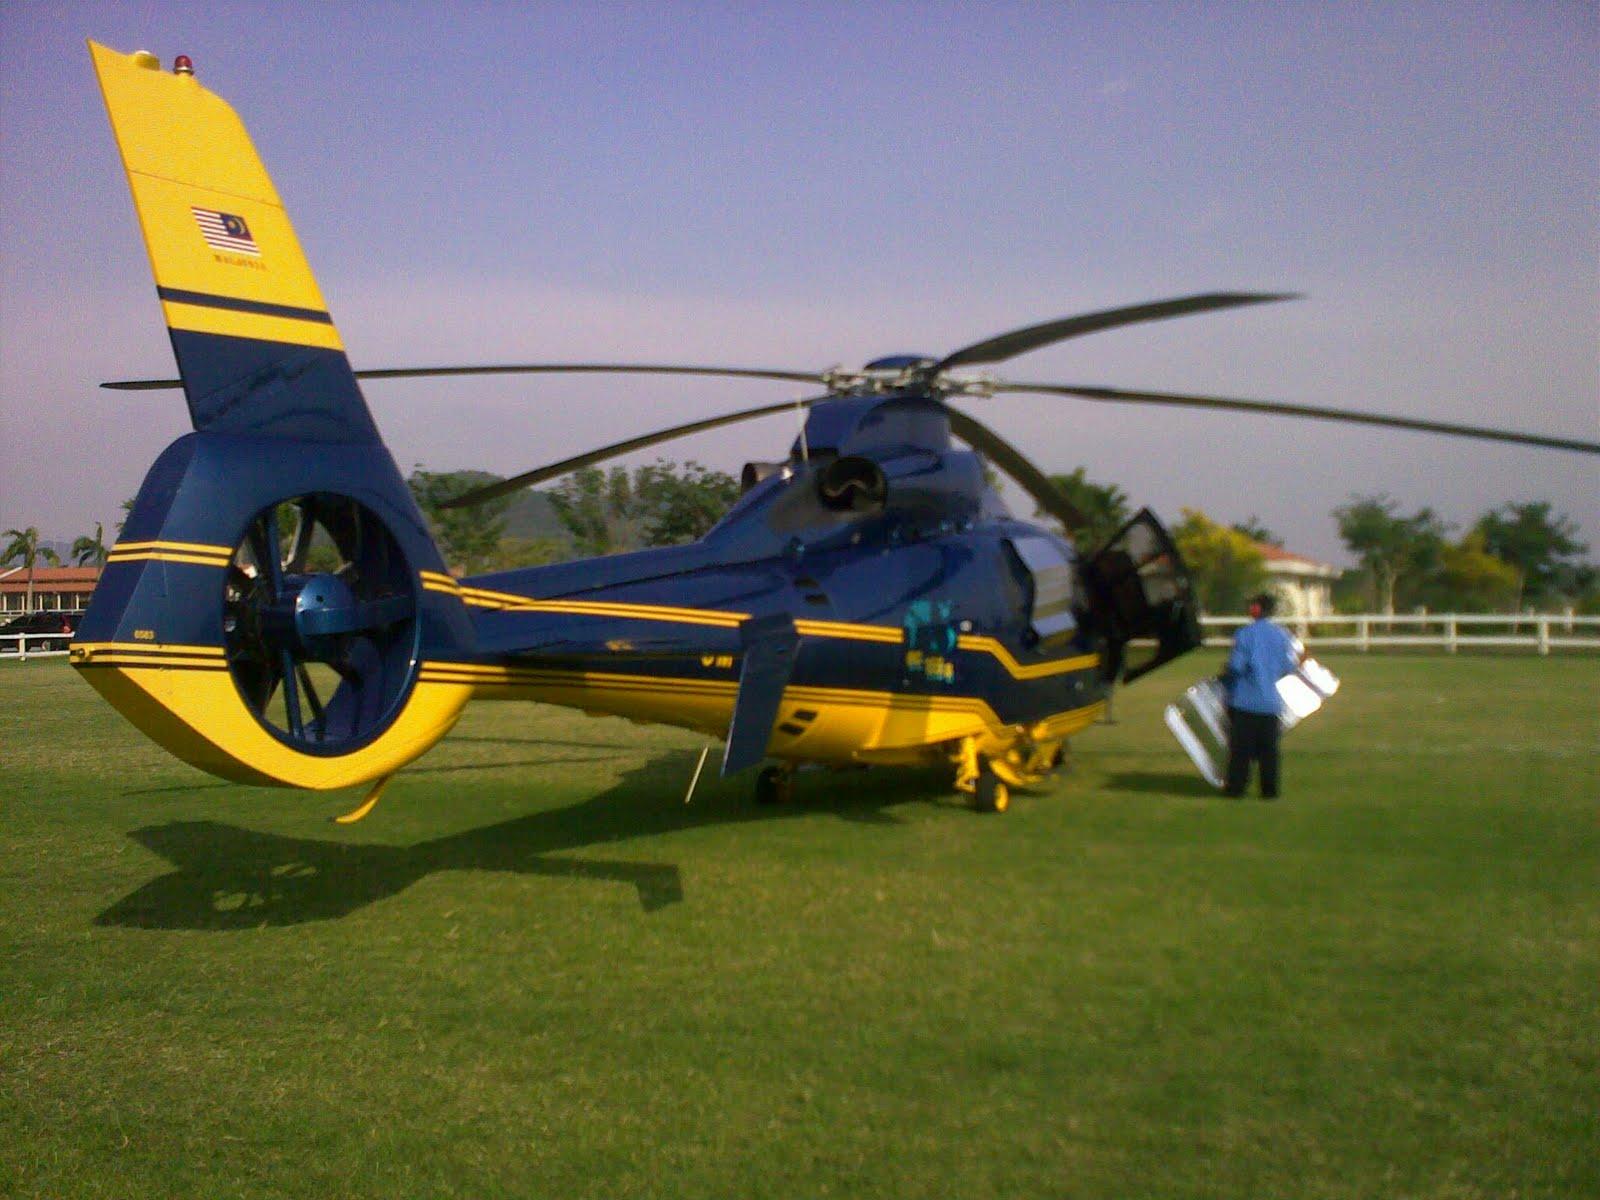 Azril Nazli Alias: Helikopter Sultan Pahang 9M-SAS